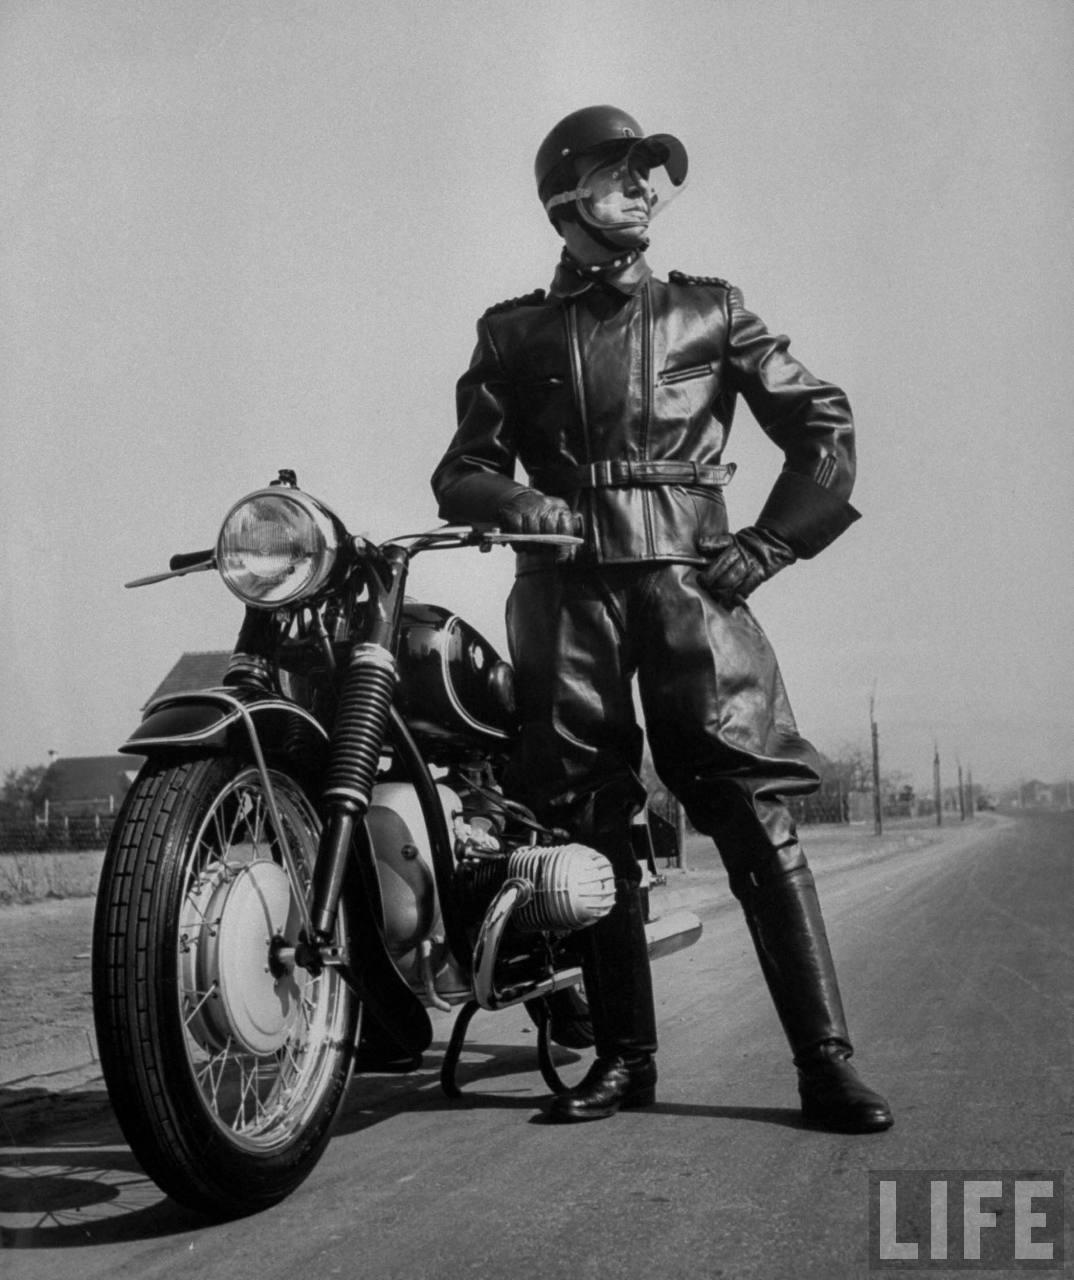 history-1954-german-motorcyclist1